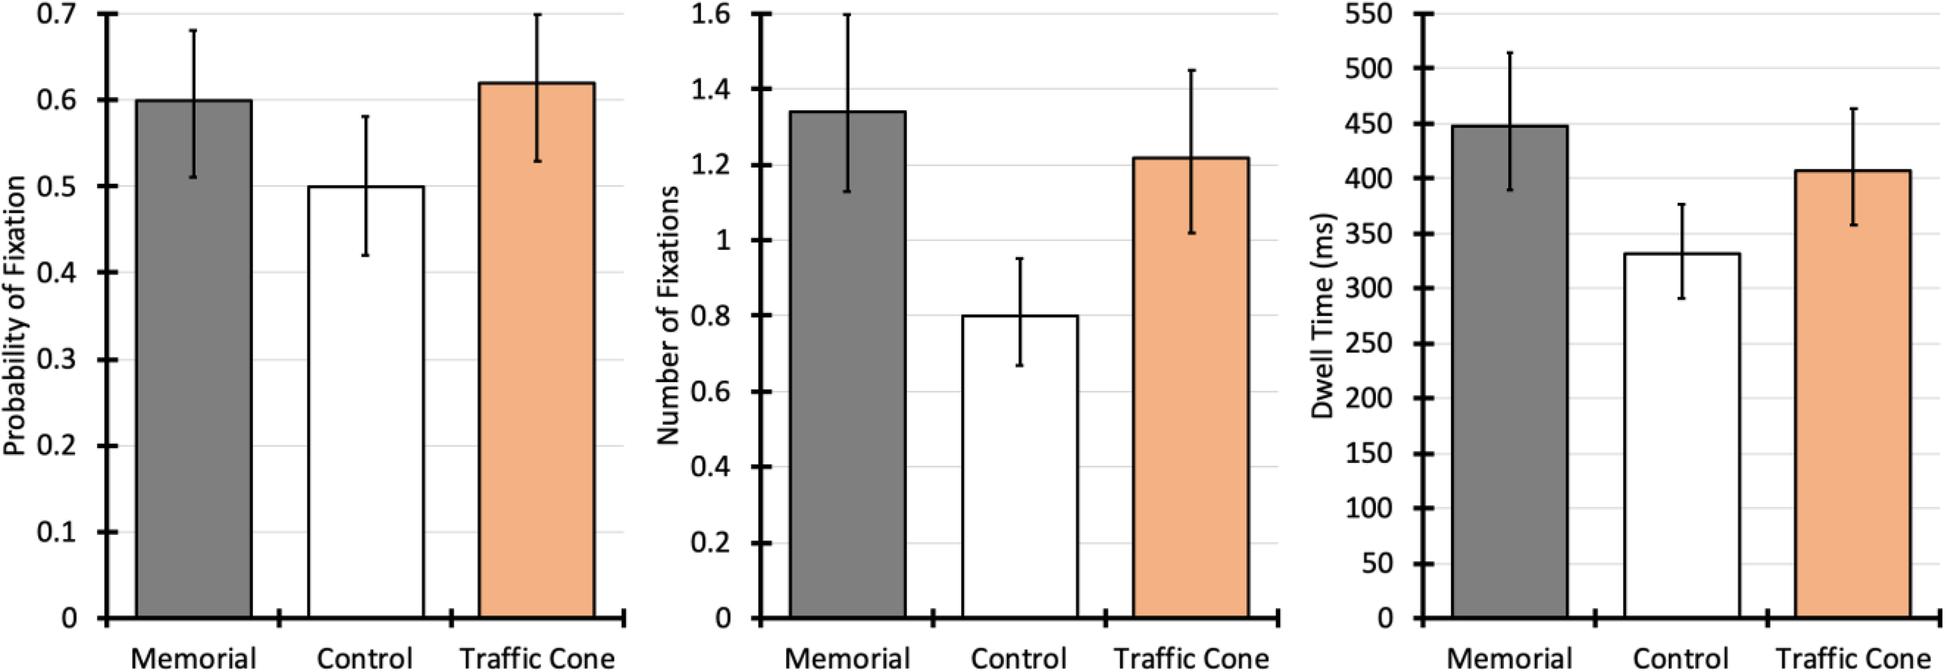 Effects of roadside memorials on drivers' risk perception